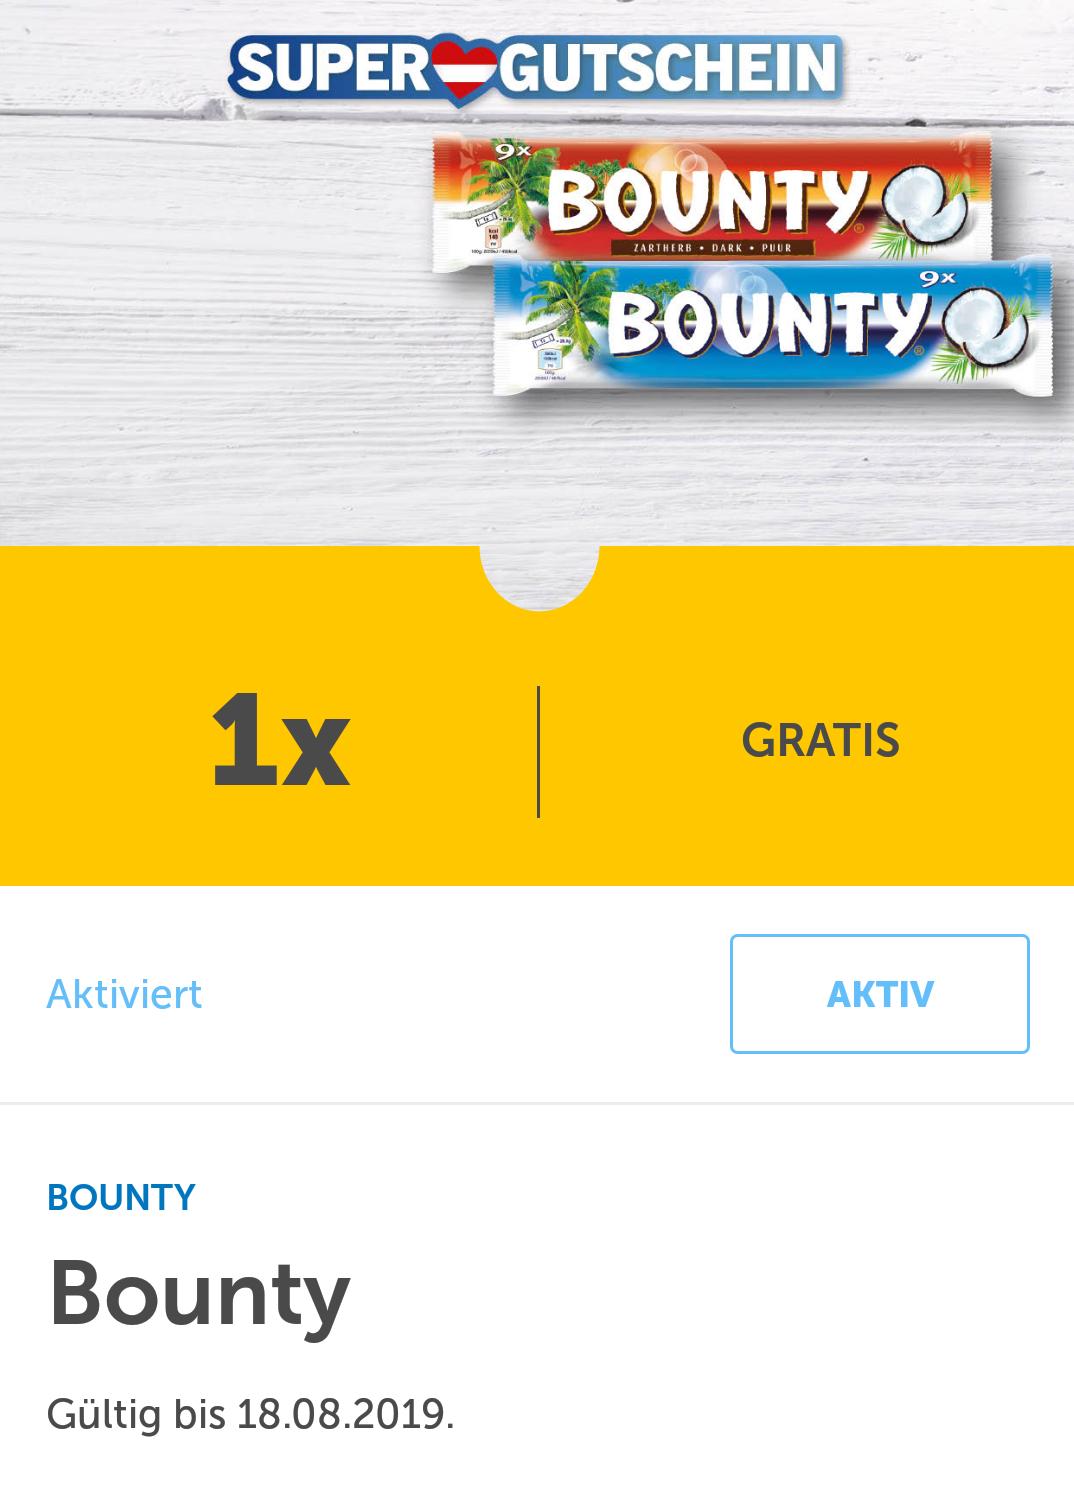 [LIDL-App] GRATIS Bounty (9 Stück Packung)